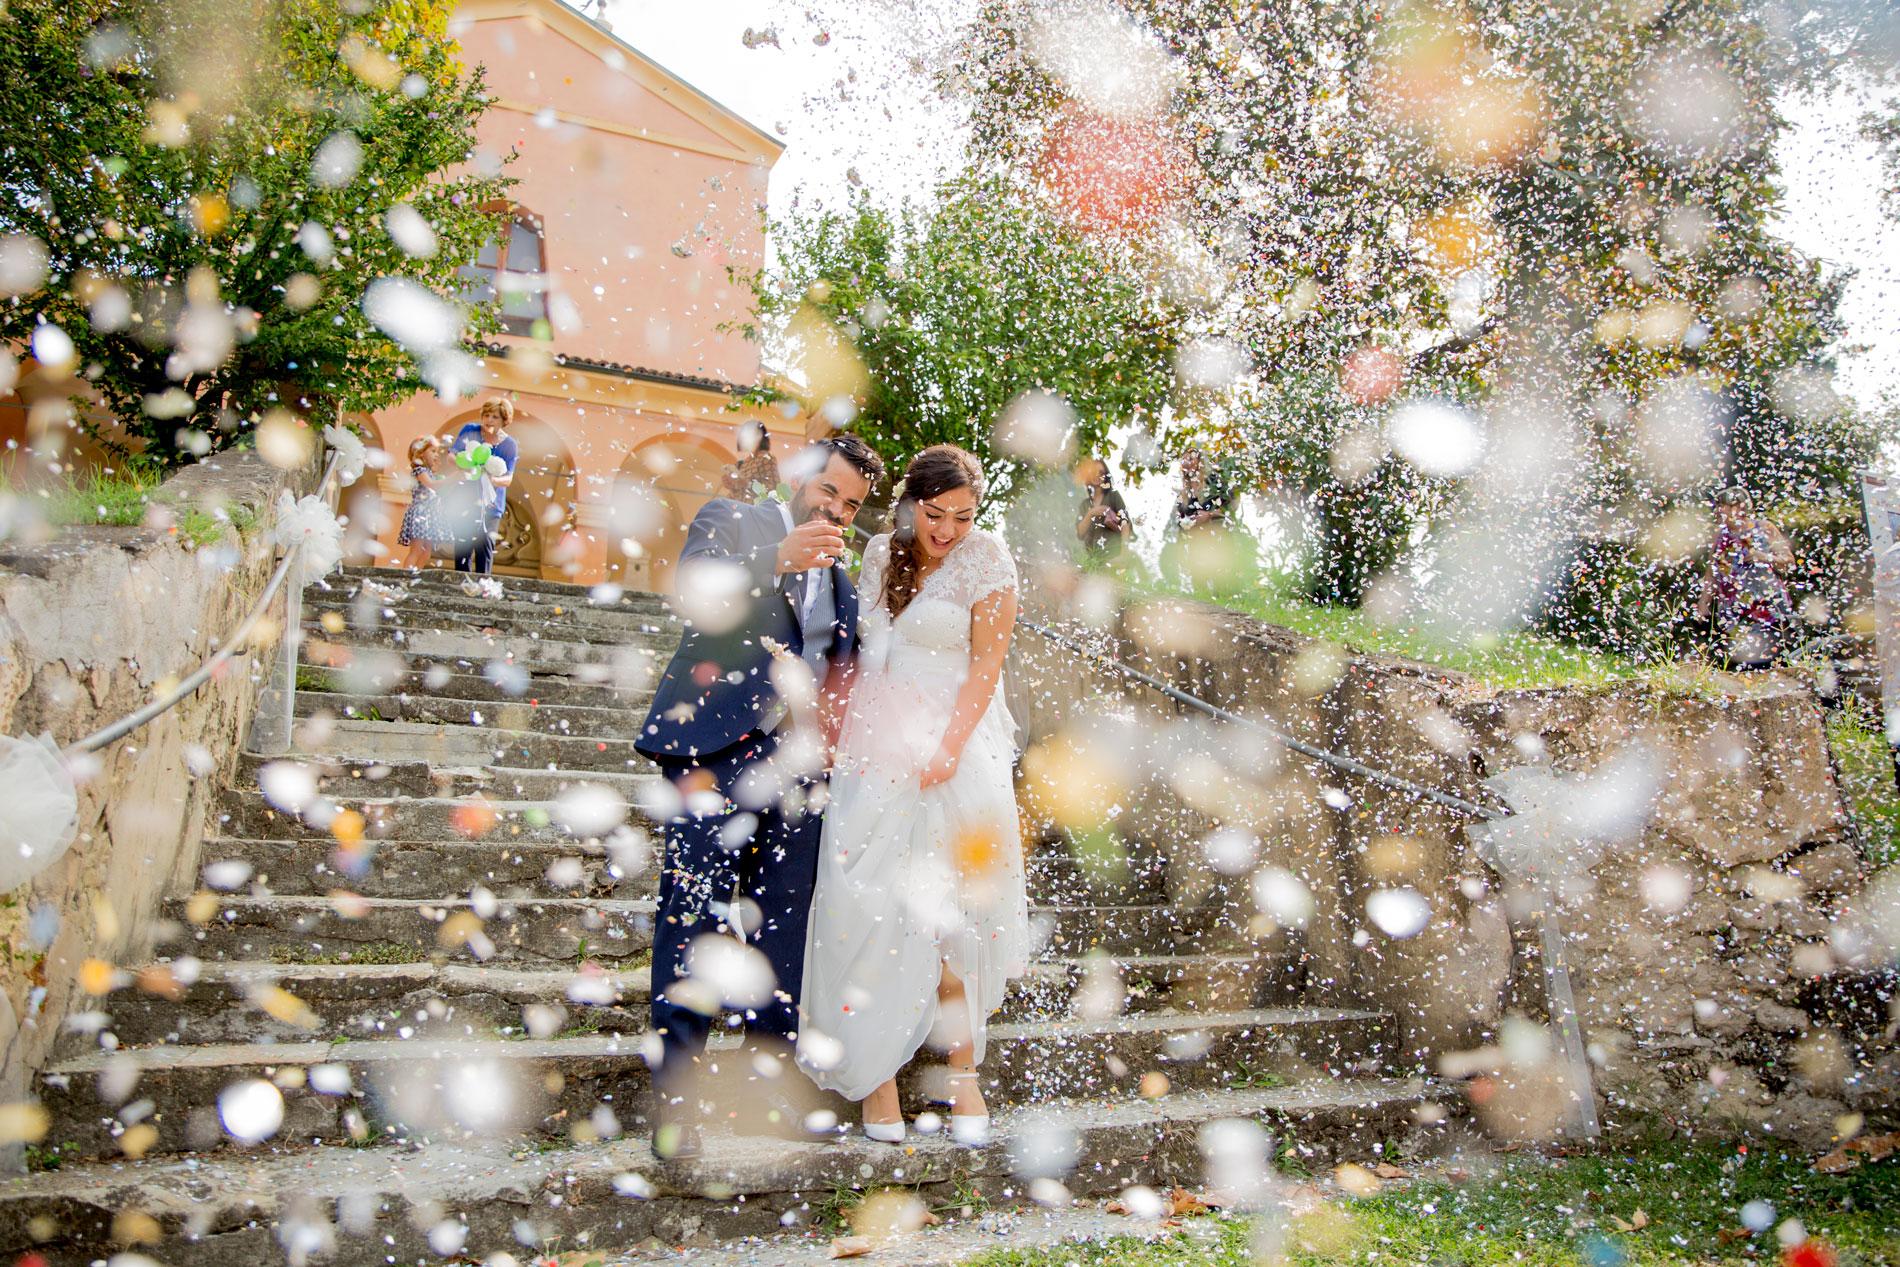 ivano-di-maria-wedding-photographer-giu-eman-10